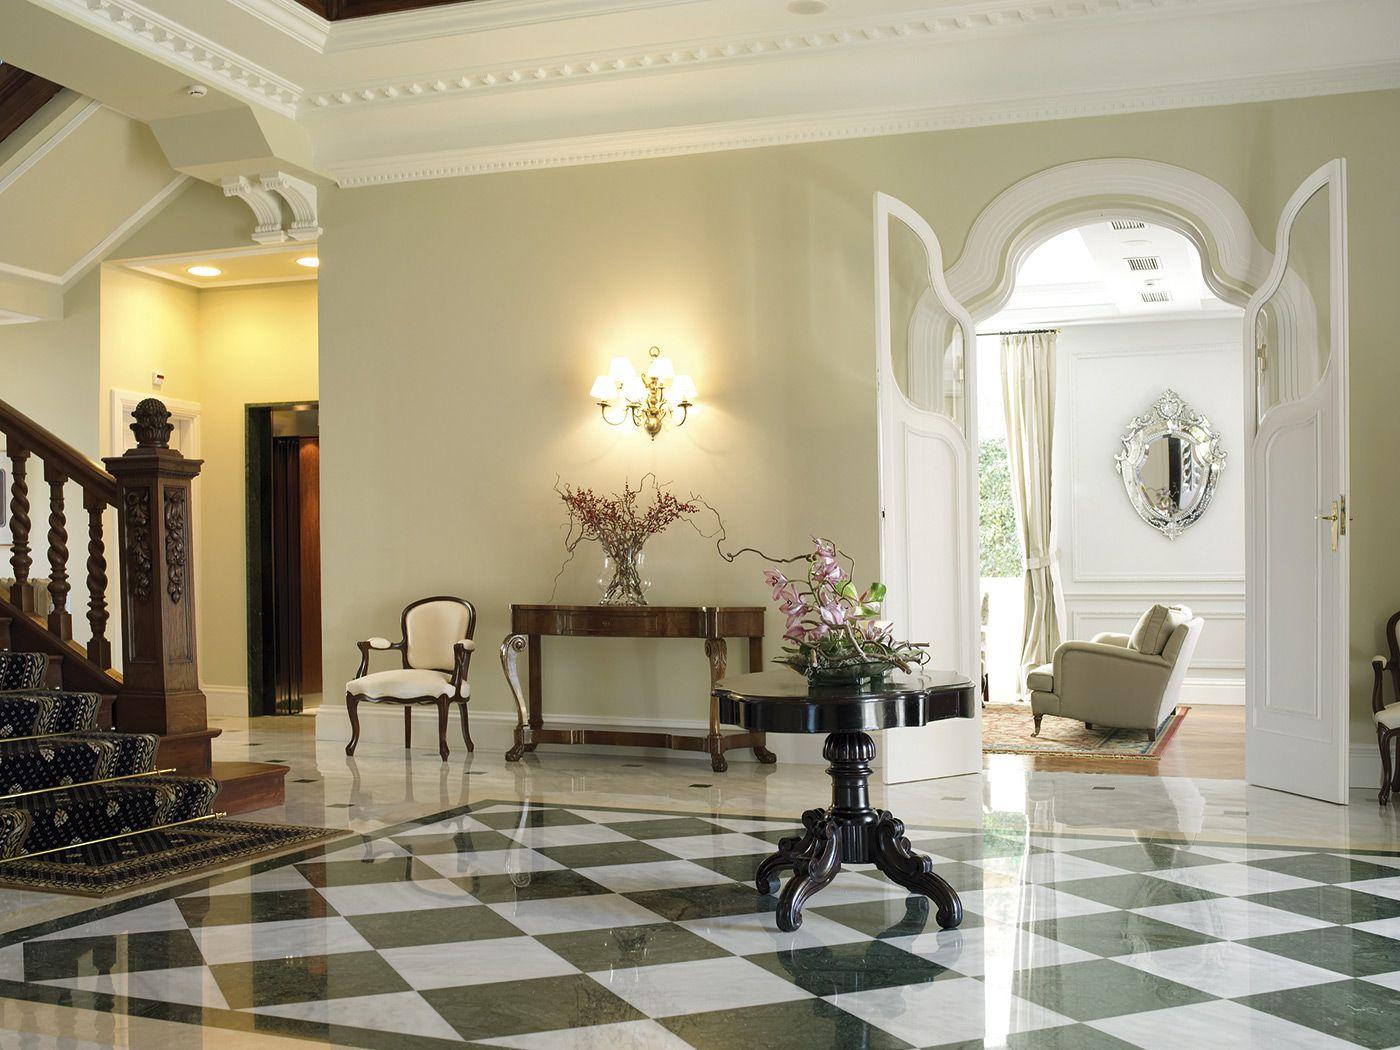 Hotel Villa Soro San Sebastian